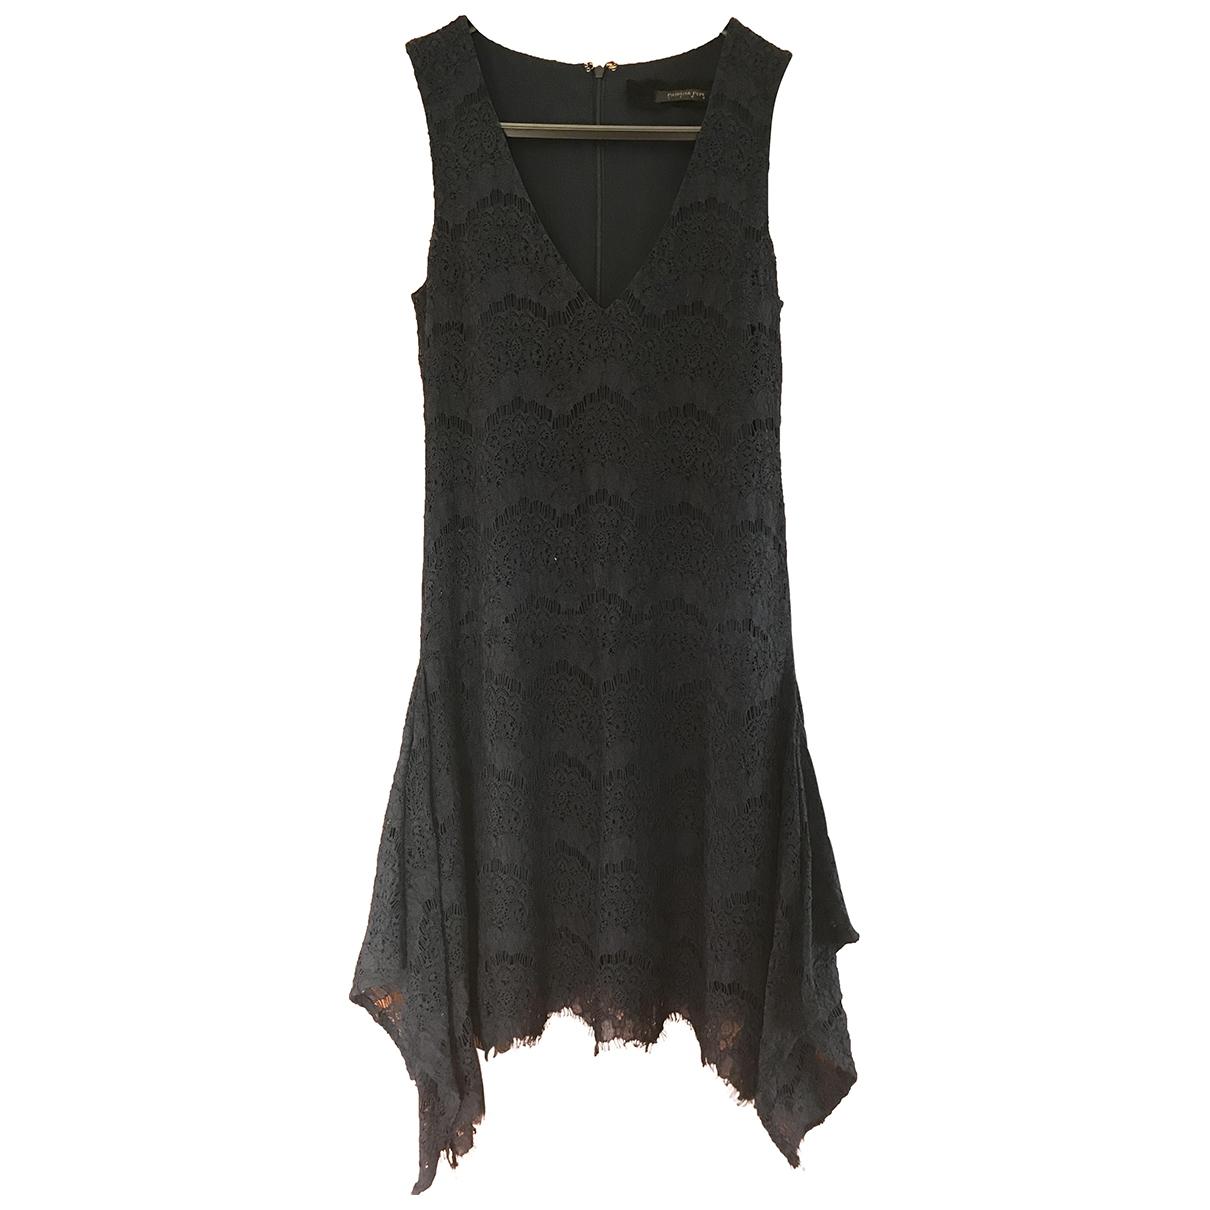 Patrizia Pepe \N Navy Lace dress for Women 42 IT